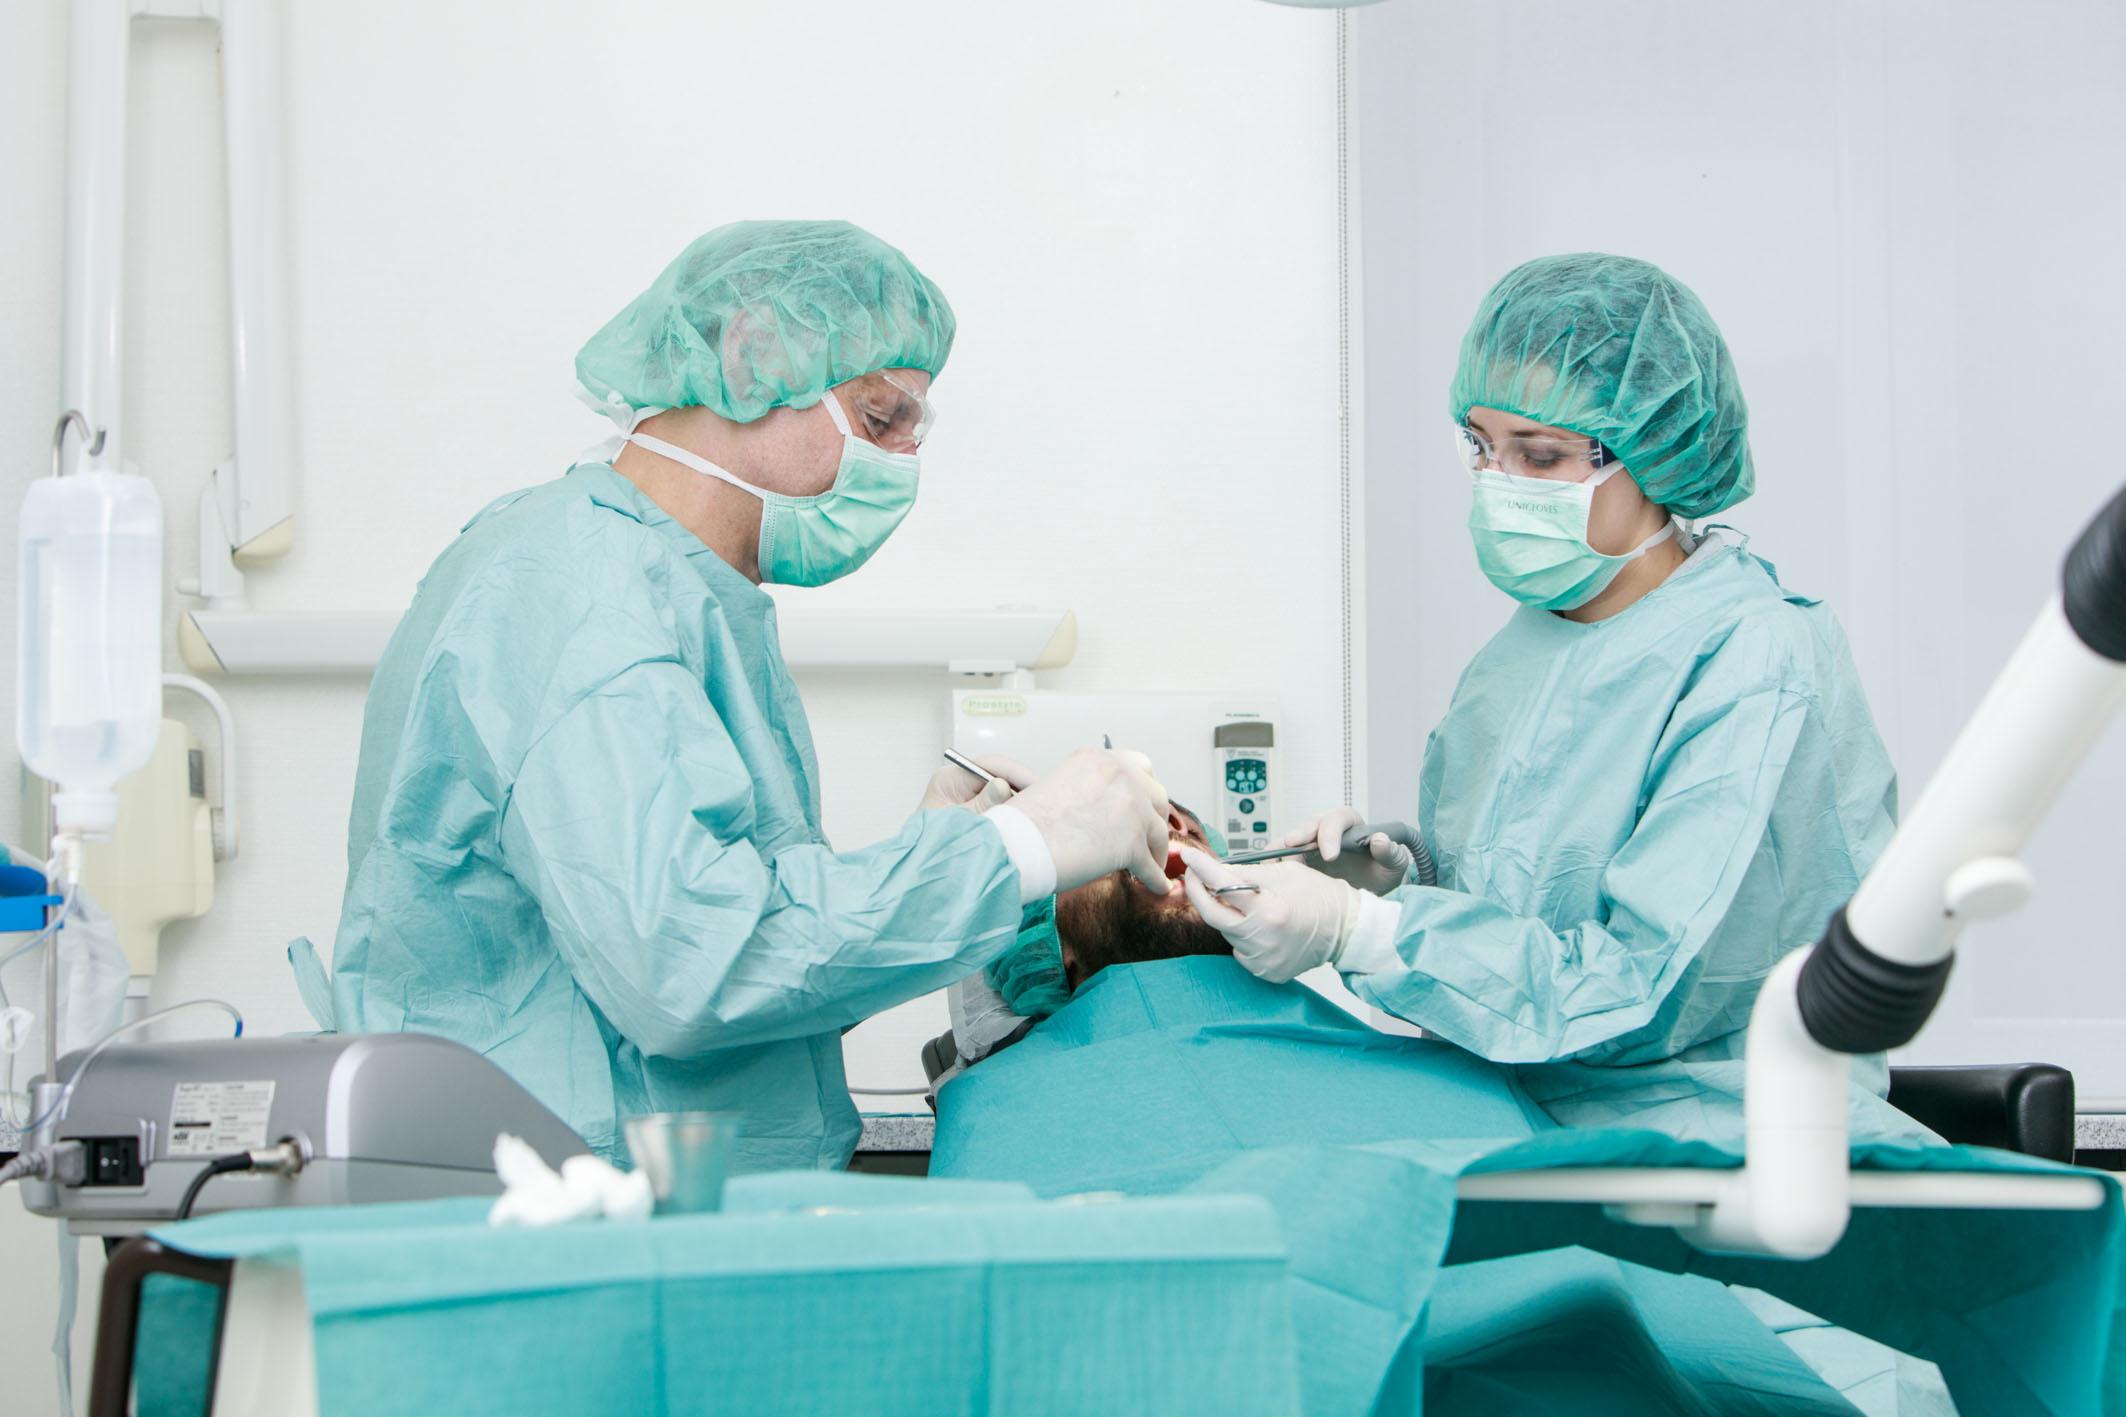 Operation Implantat